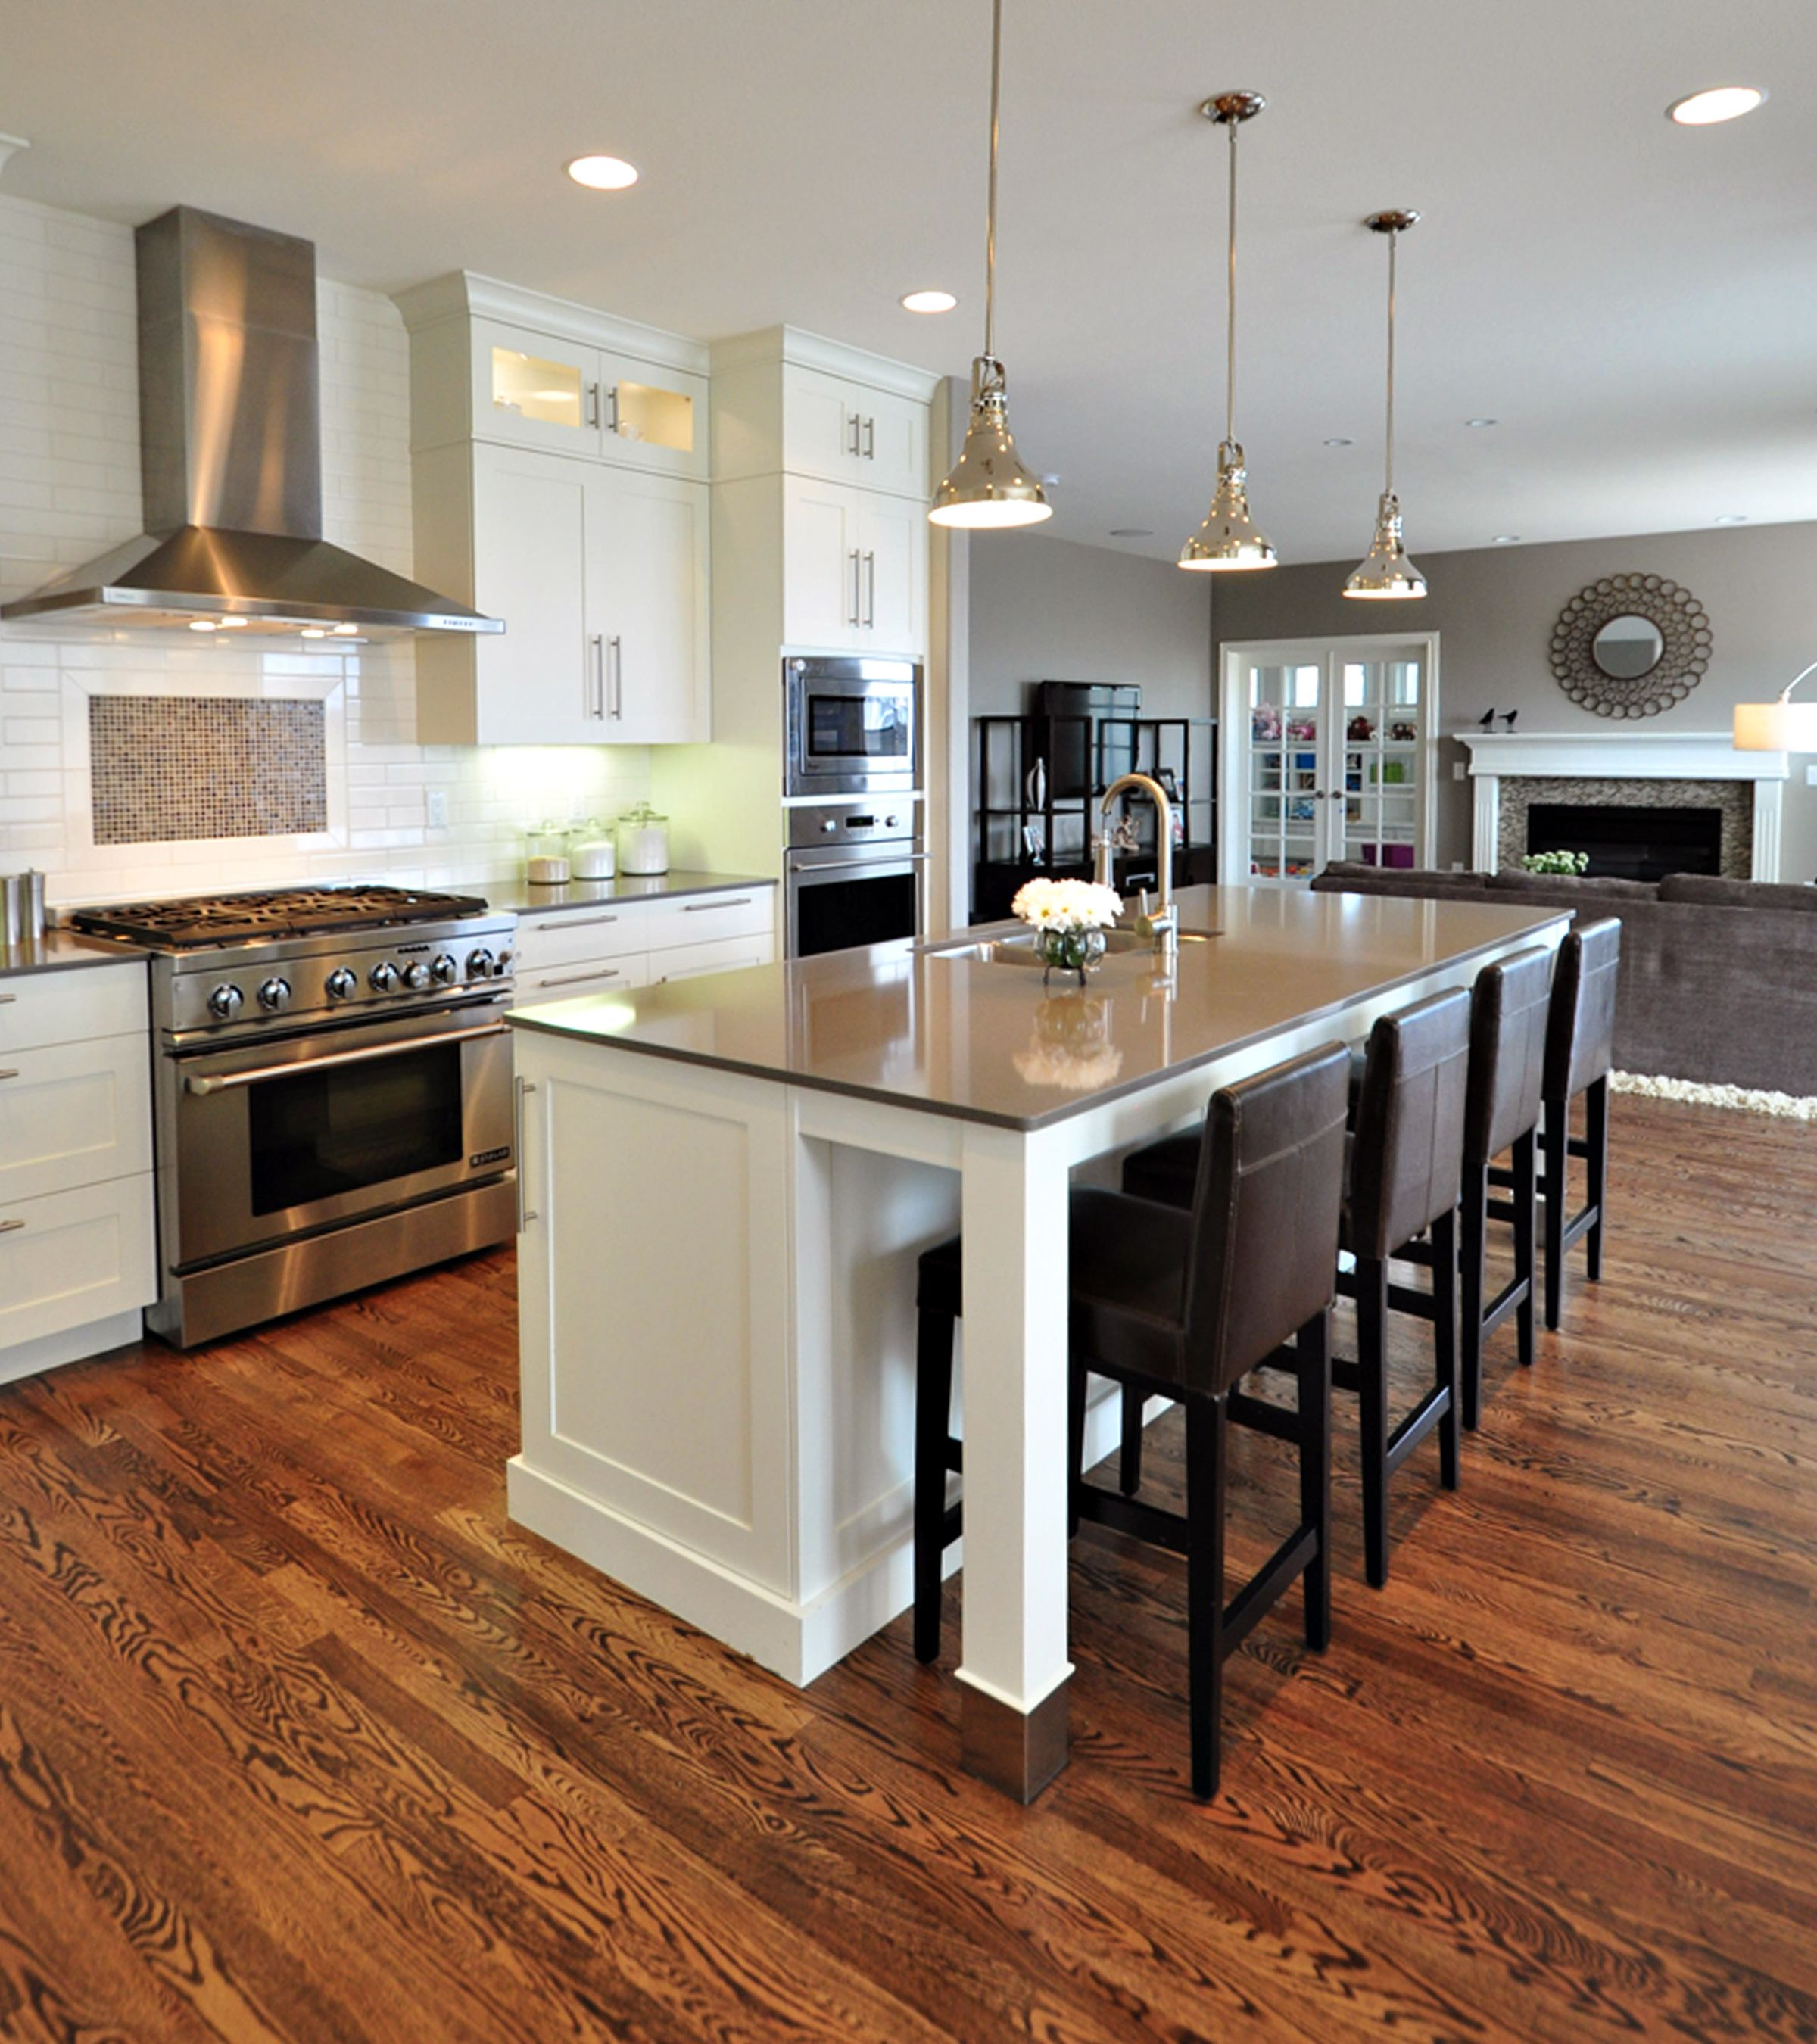 White Kitchen Cabinets Large Island: White Kitchen, Gray Countertops, Large Island, Stinless